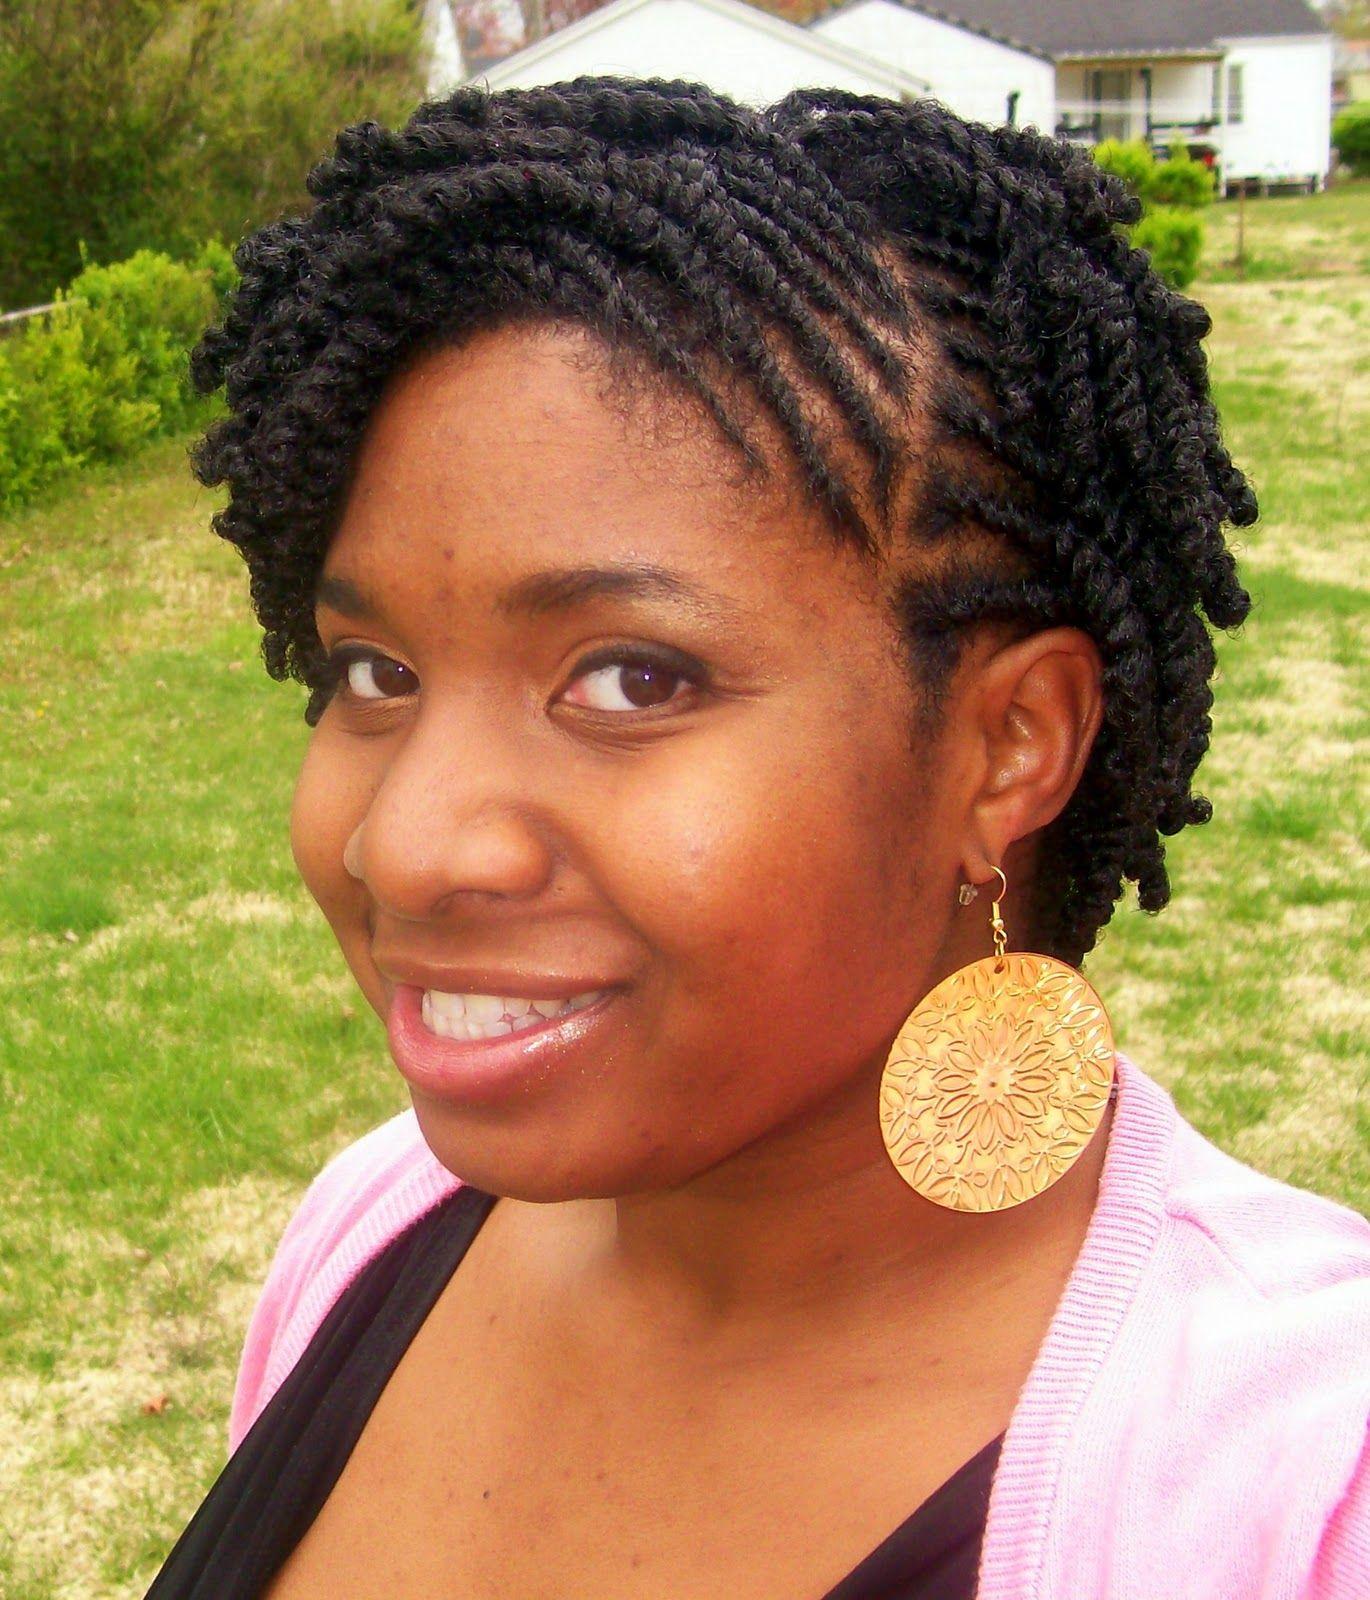 Fantastic 1000 Images About Natural Hair On Pinterest Black Women Natural Short Hairstyles For Black Women Fulllsitofus